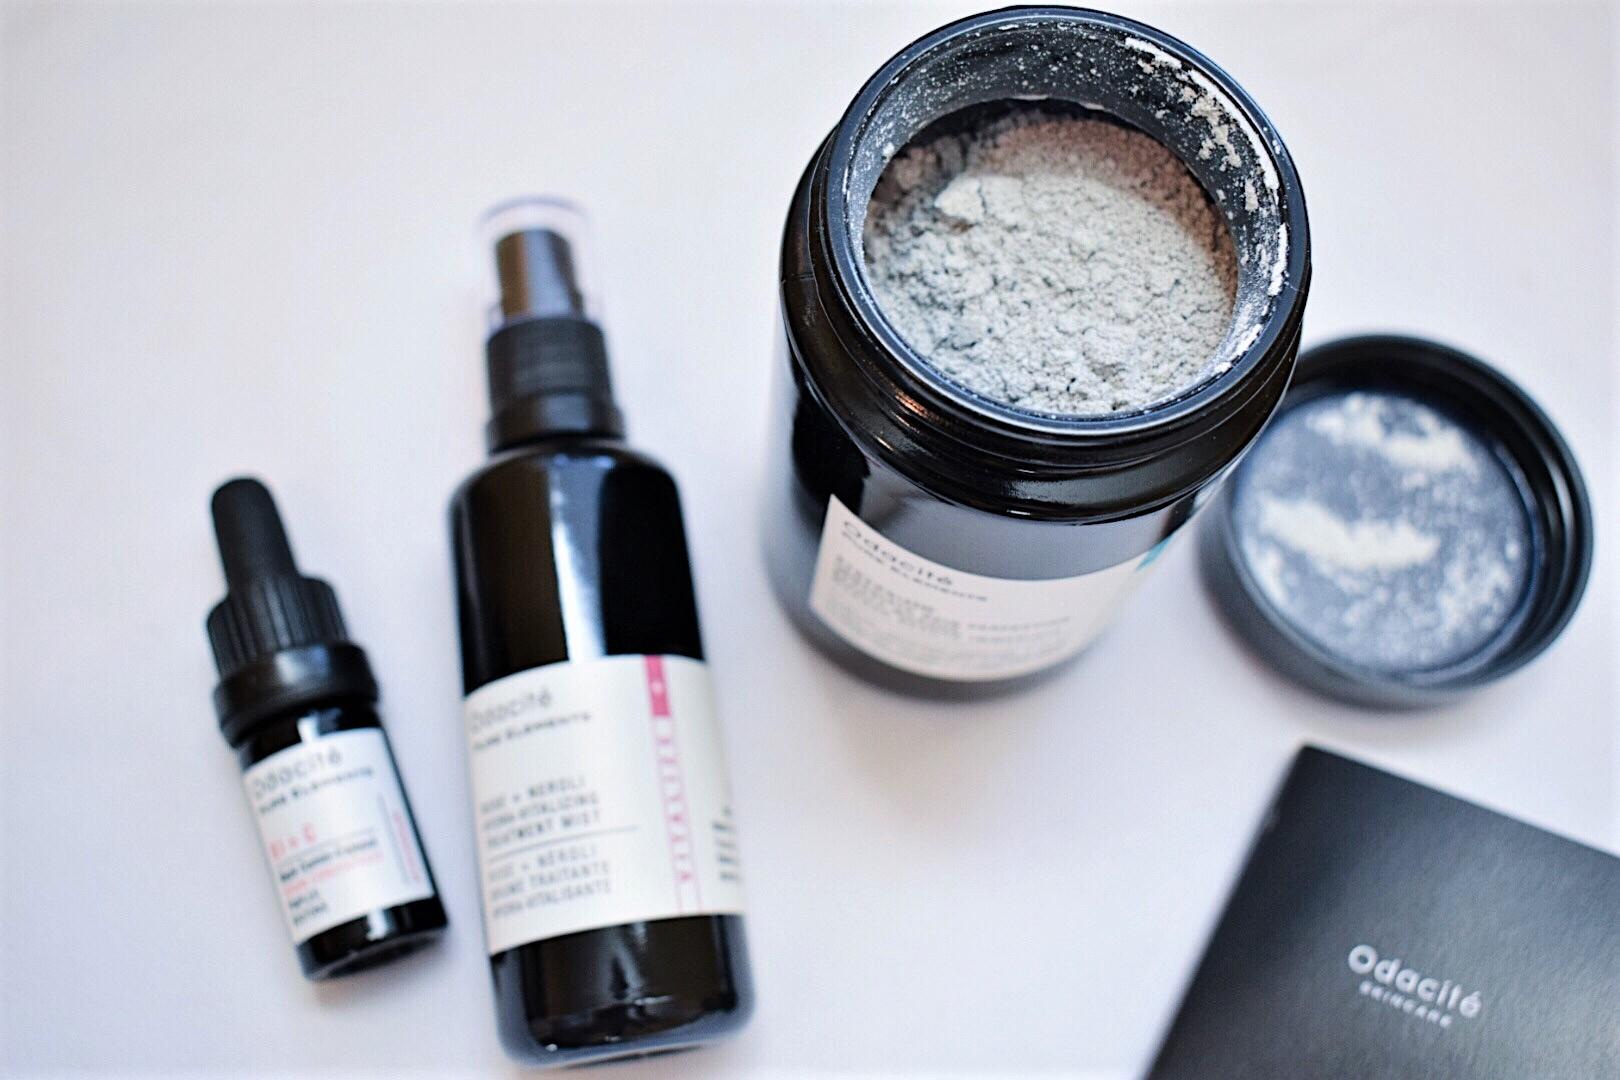 Odacite All Natural Skincare Review 4.jpg